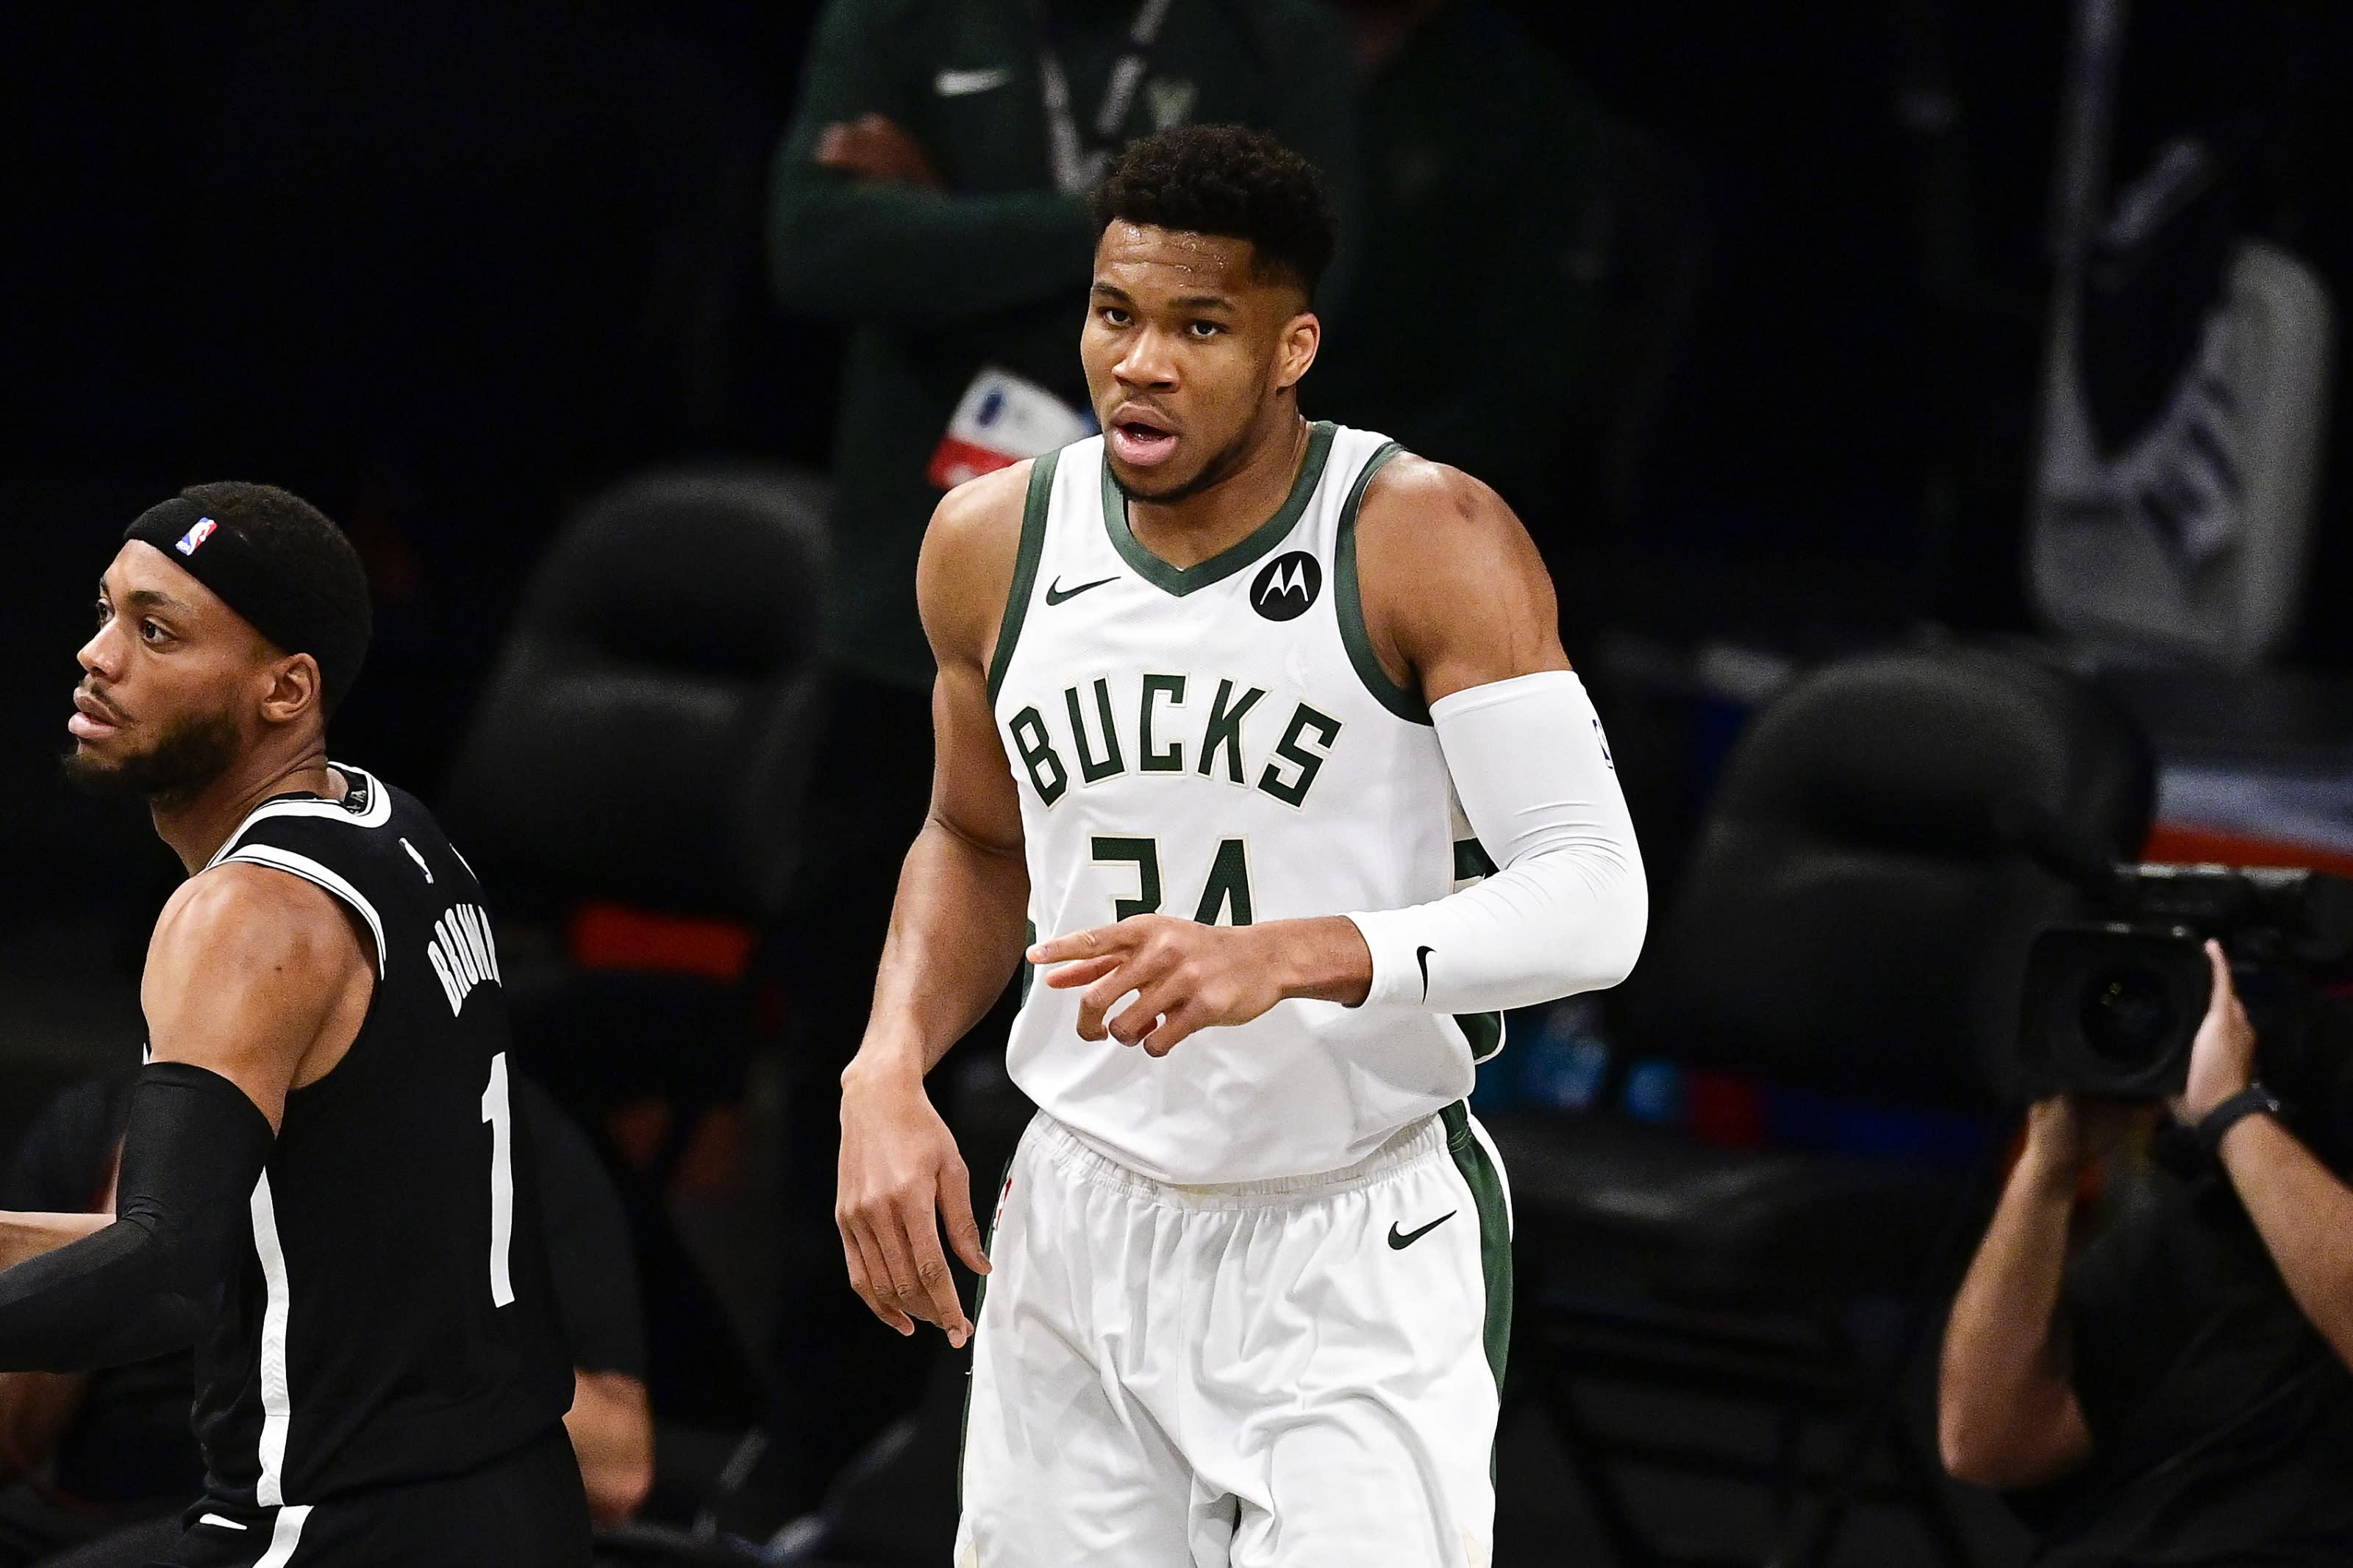 Milwaukee Bucks: Giannis Antetokounmpo, Brooklyn Nets: Bruce Brown